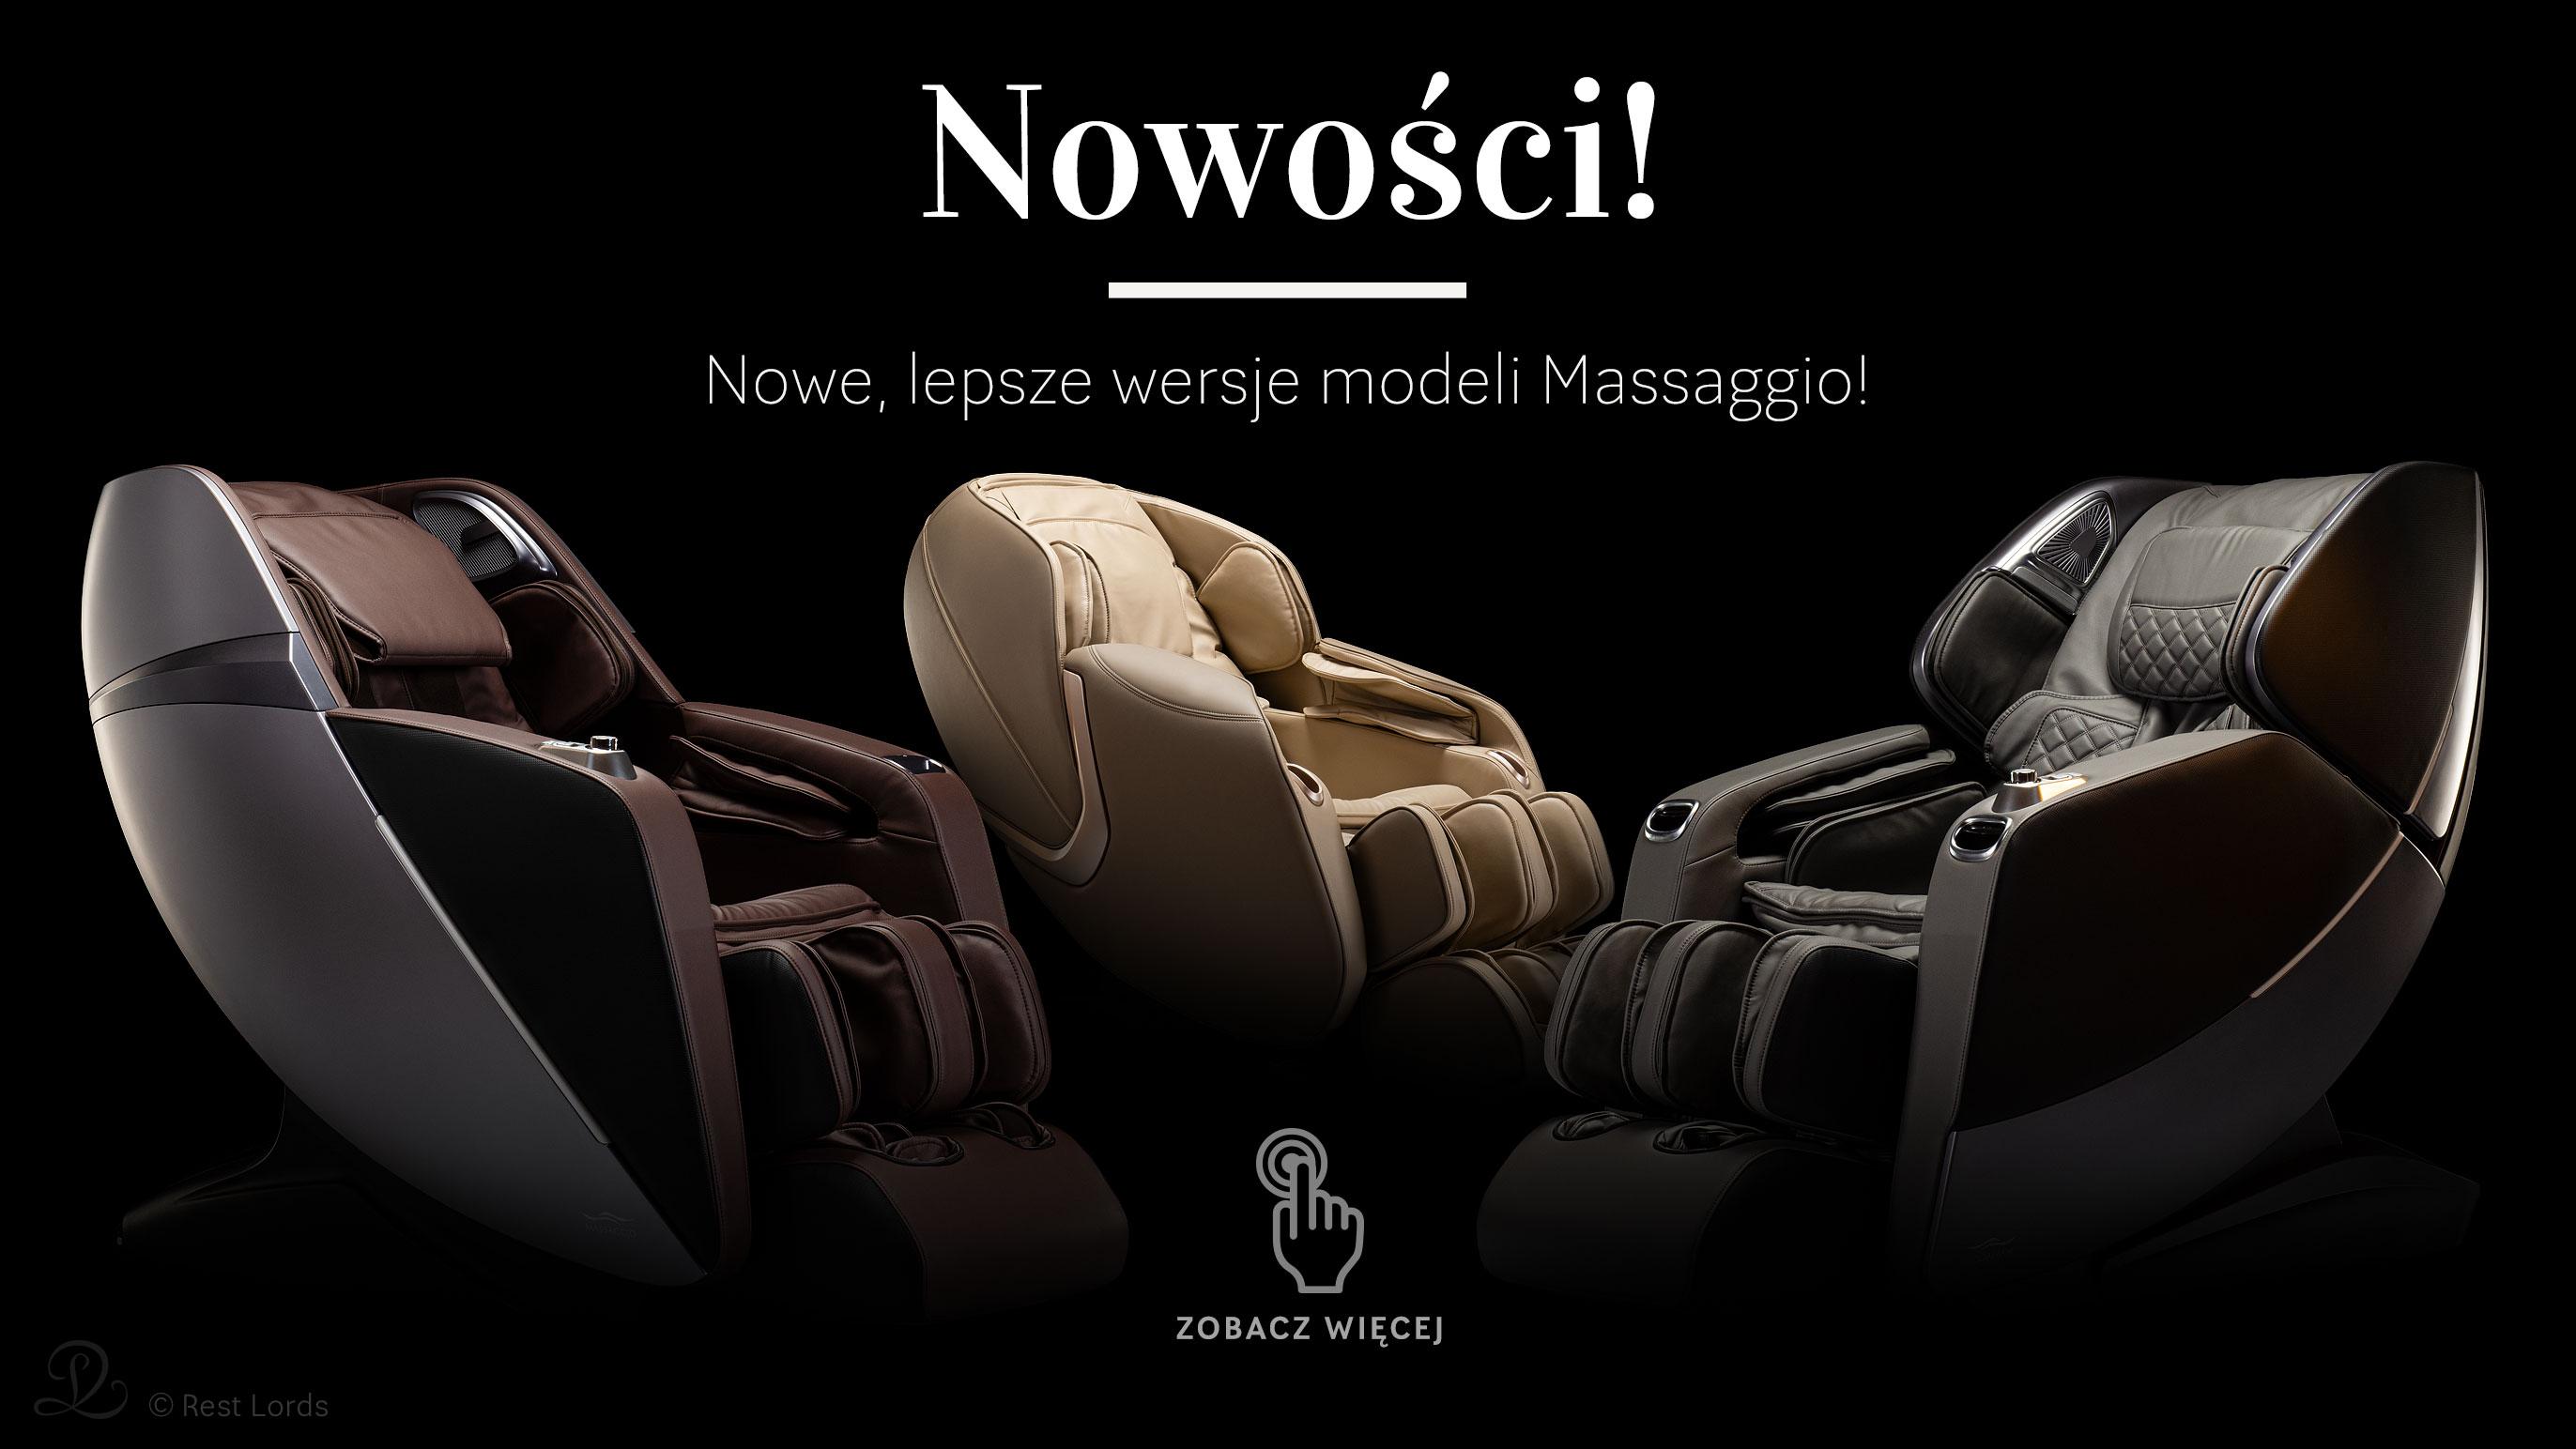 Nowe fotele Massaggio 2020